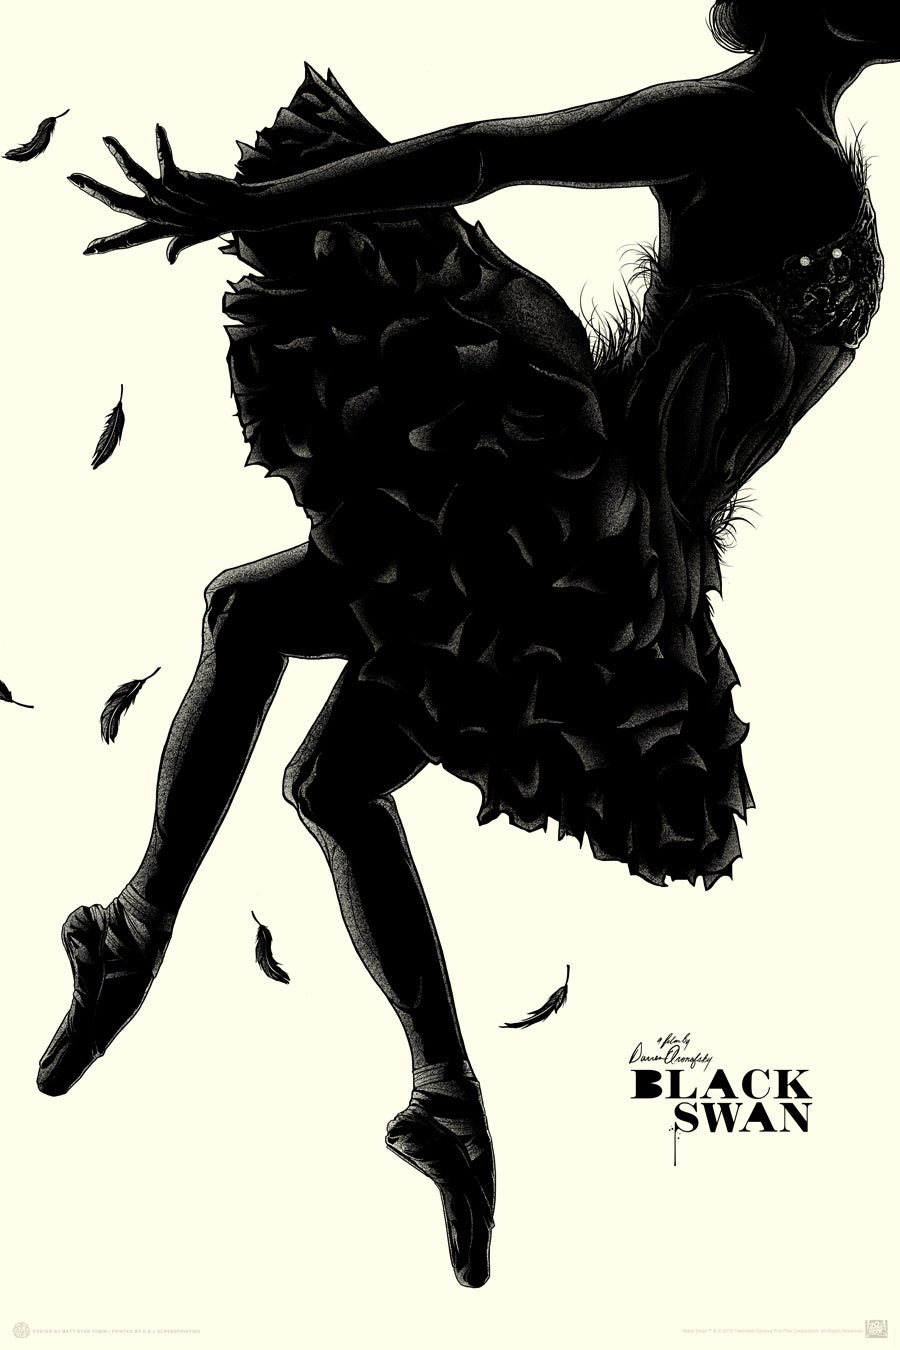 MONDO BLACK SWAN - Regular